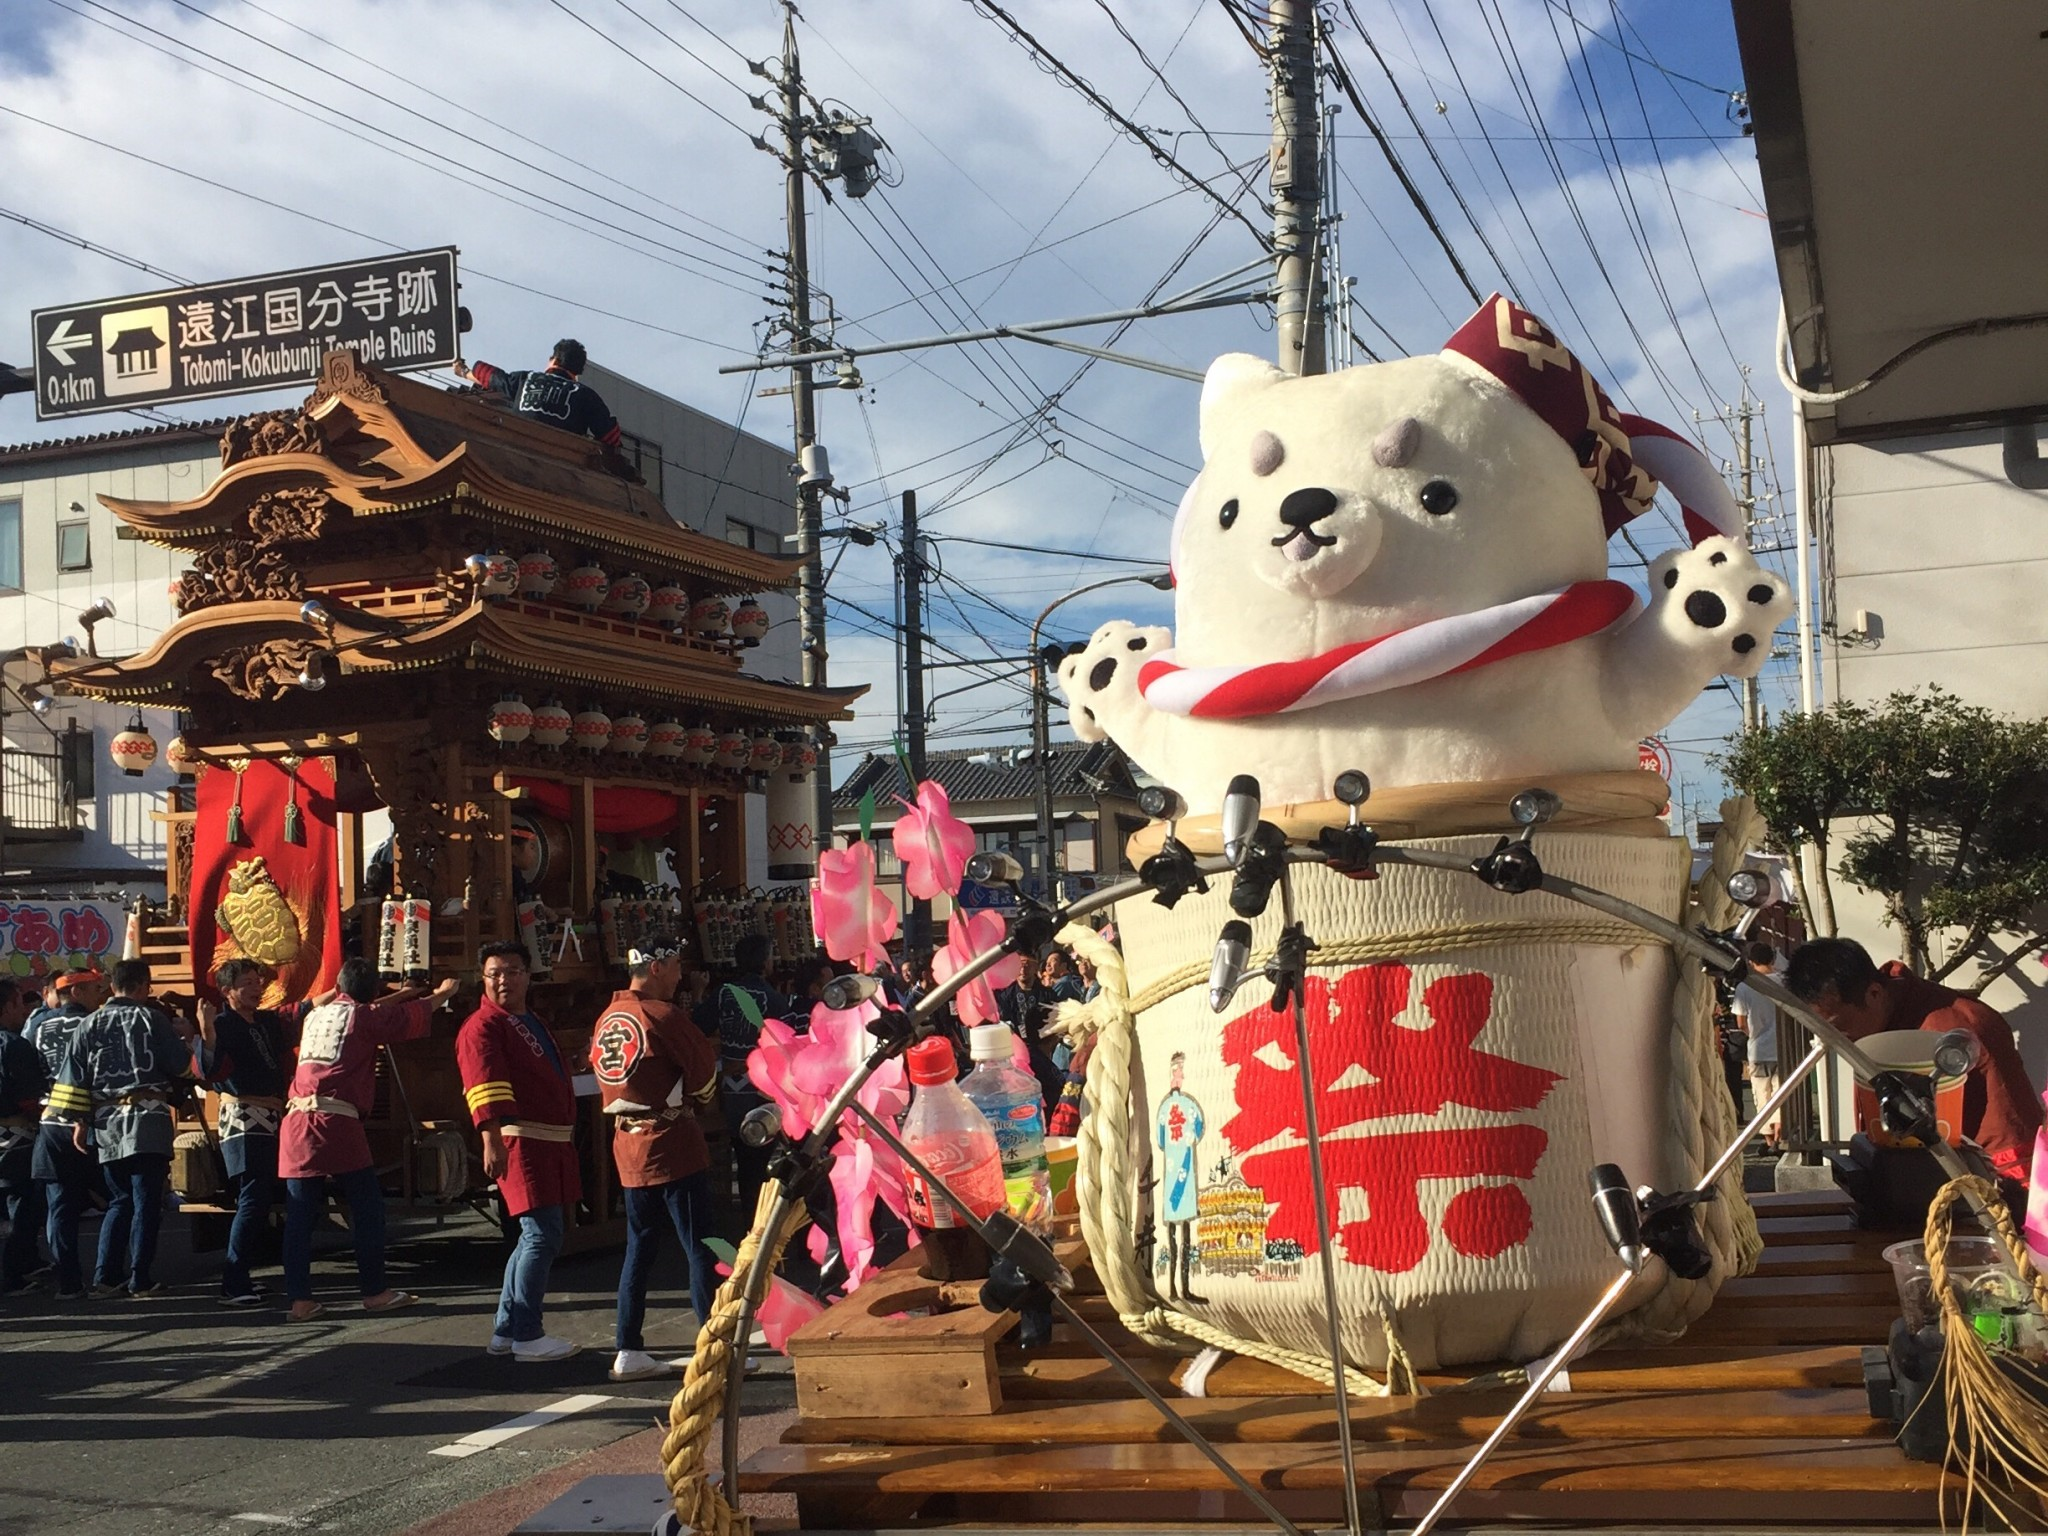 The Legend of the White Dog, Shippei Taro